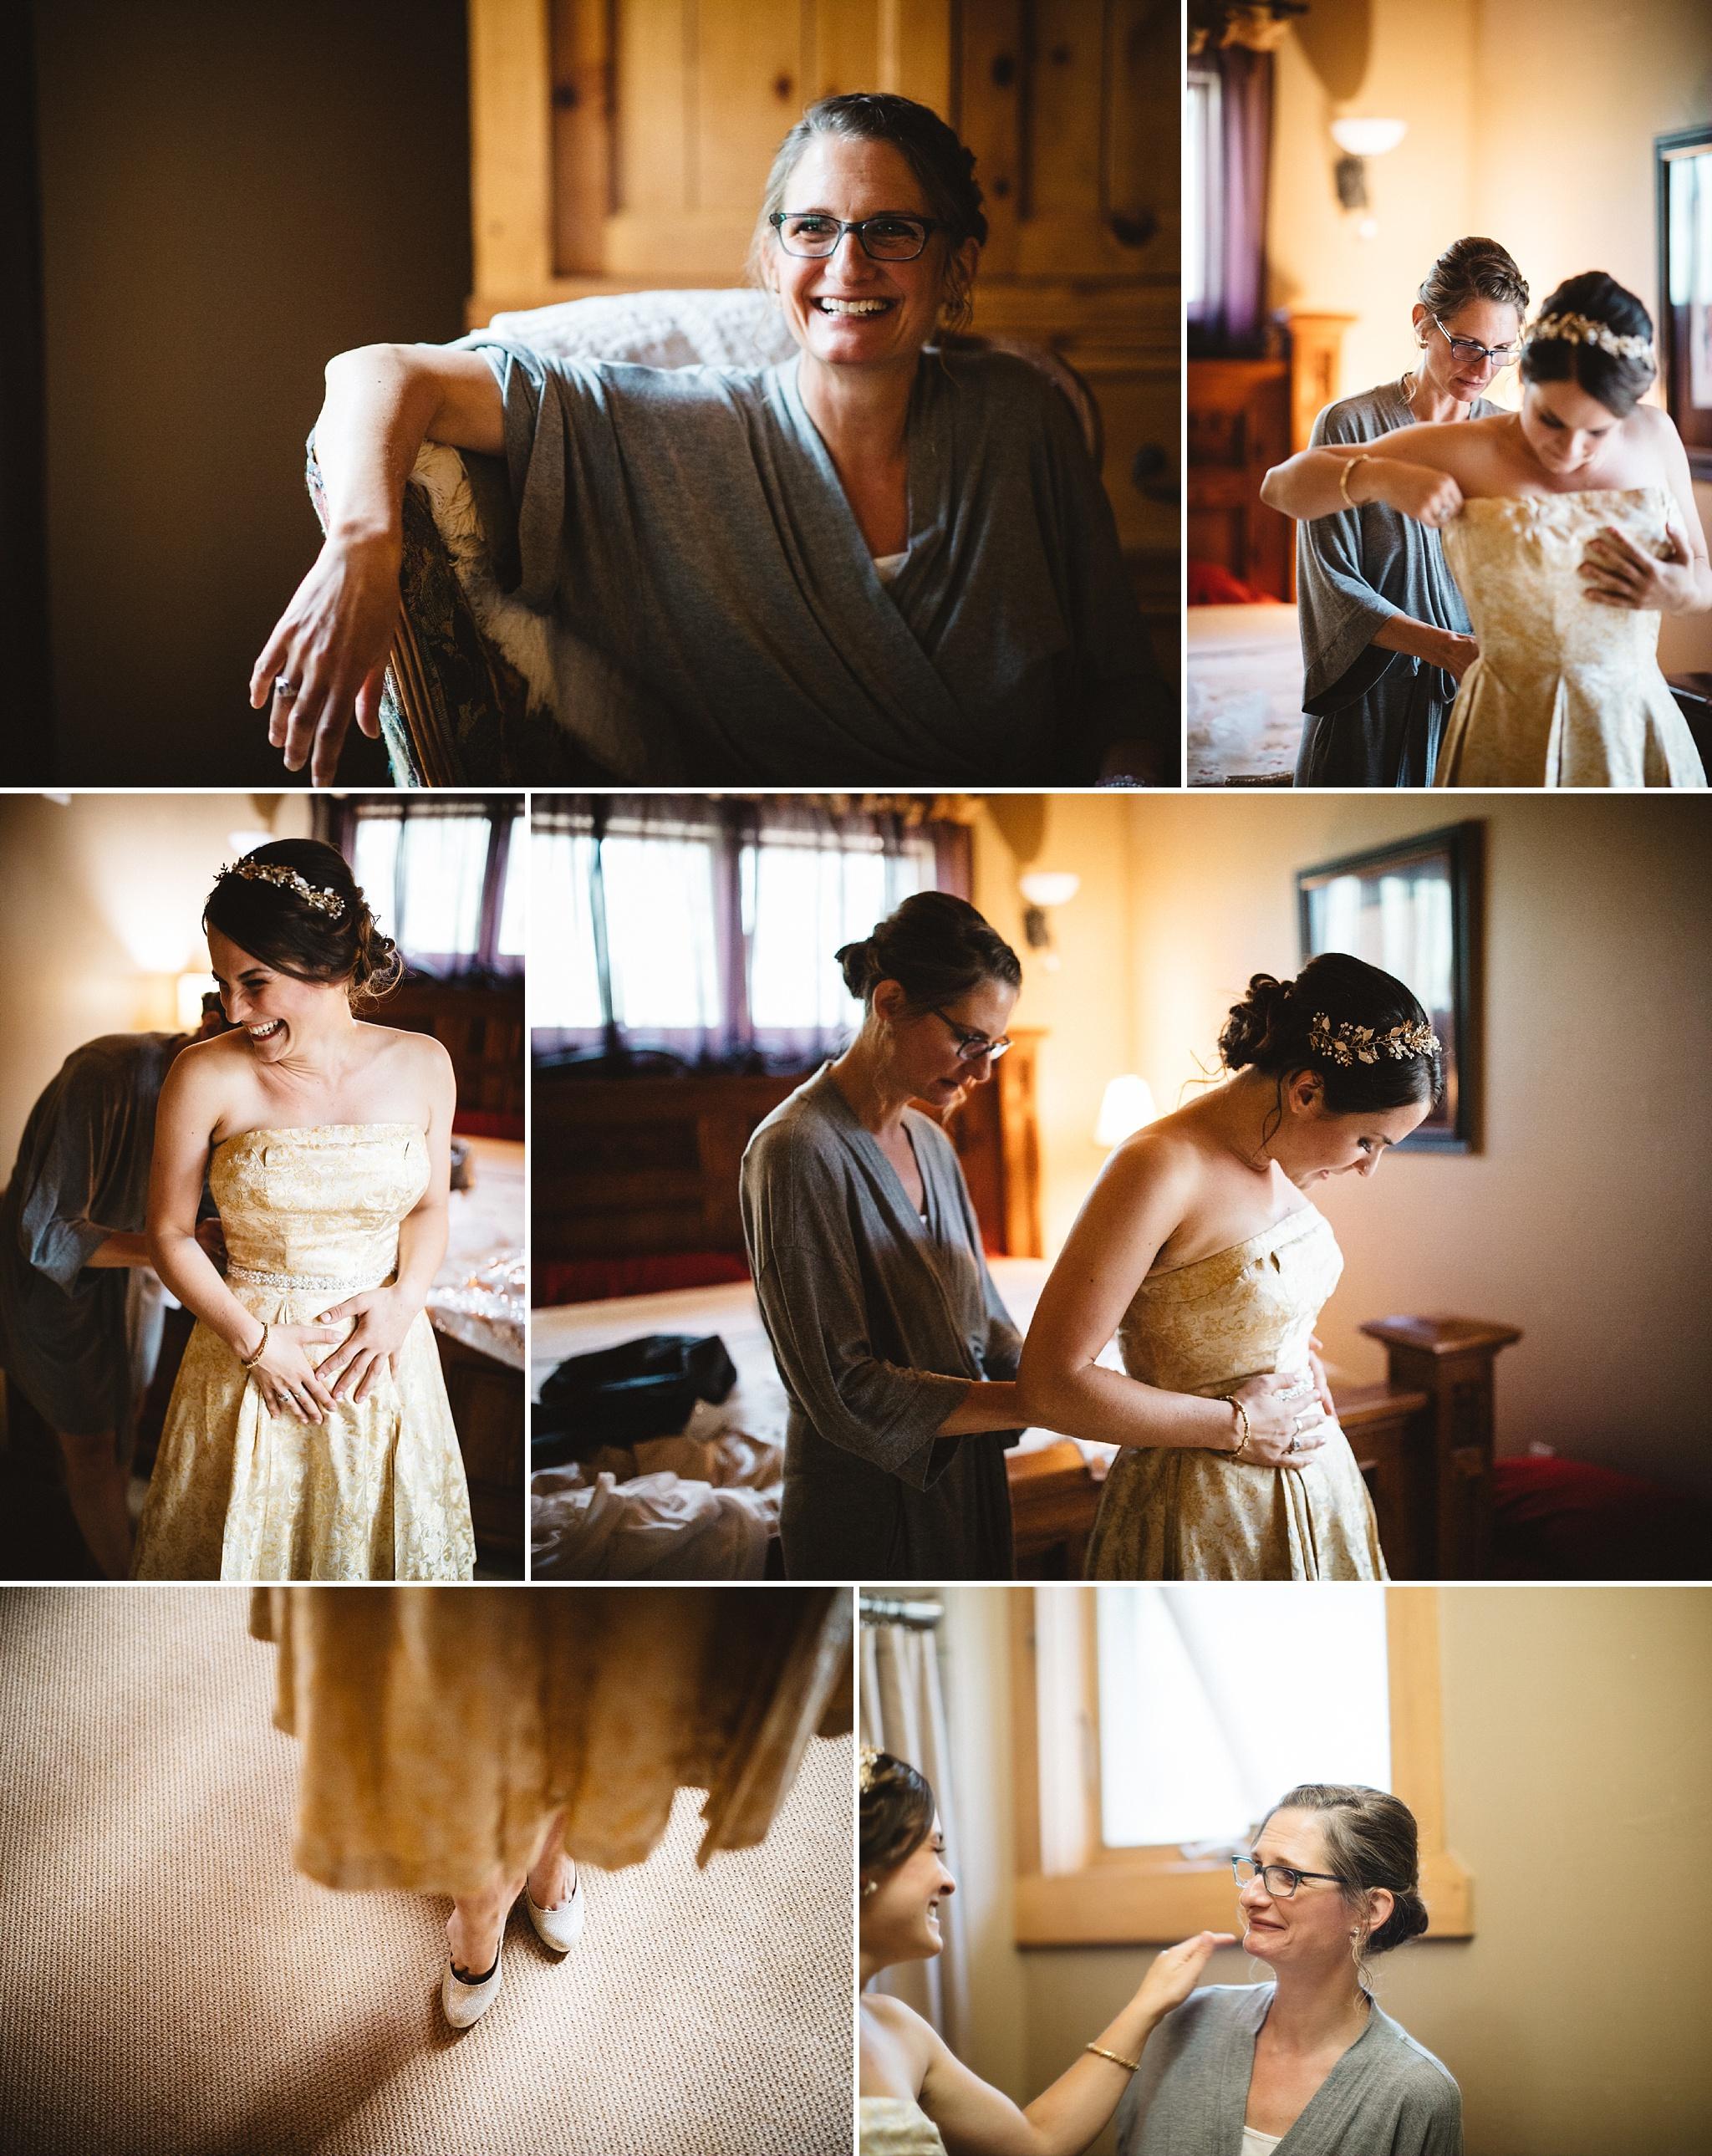 Ansley+Julian-Willow-Creek-Ranch-Evergreen-Wedding-017_WEB.jpg